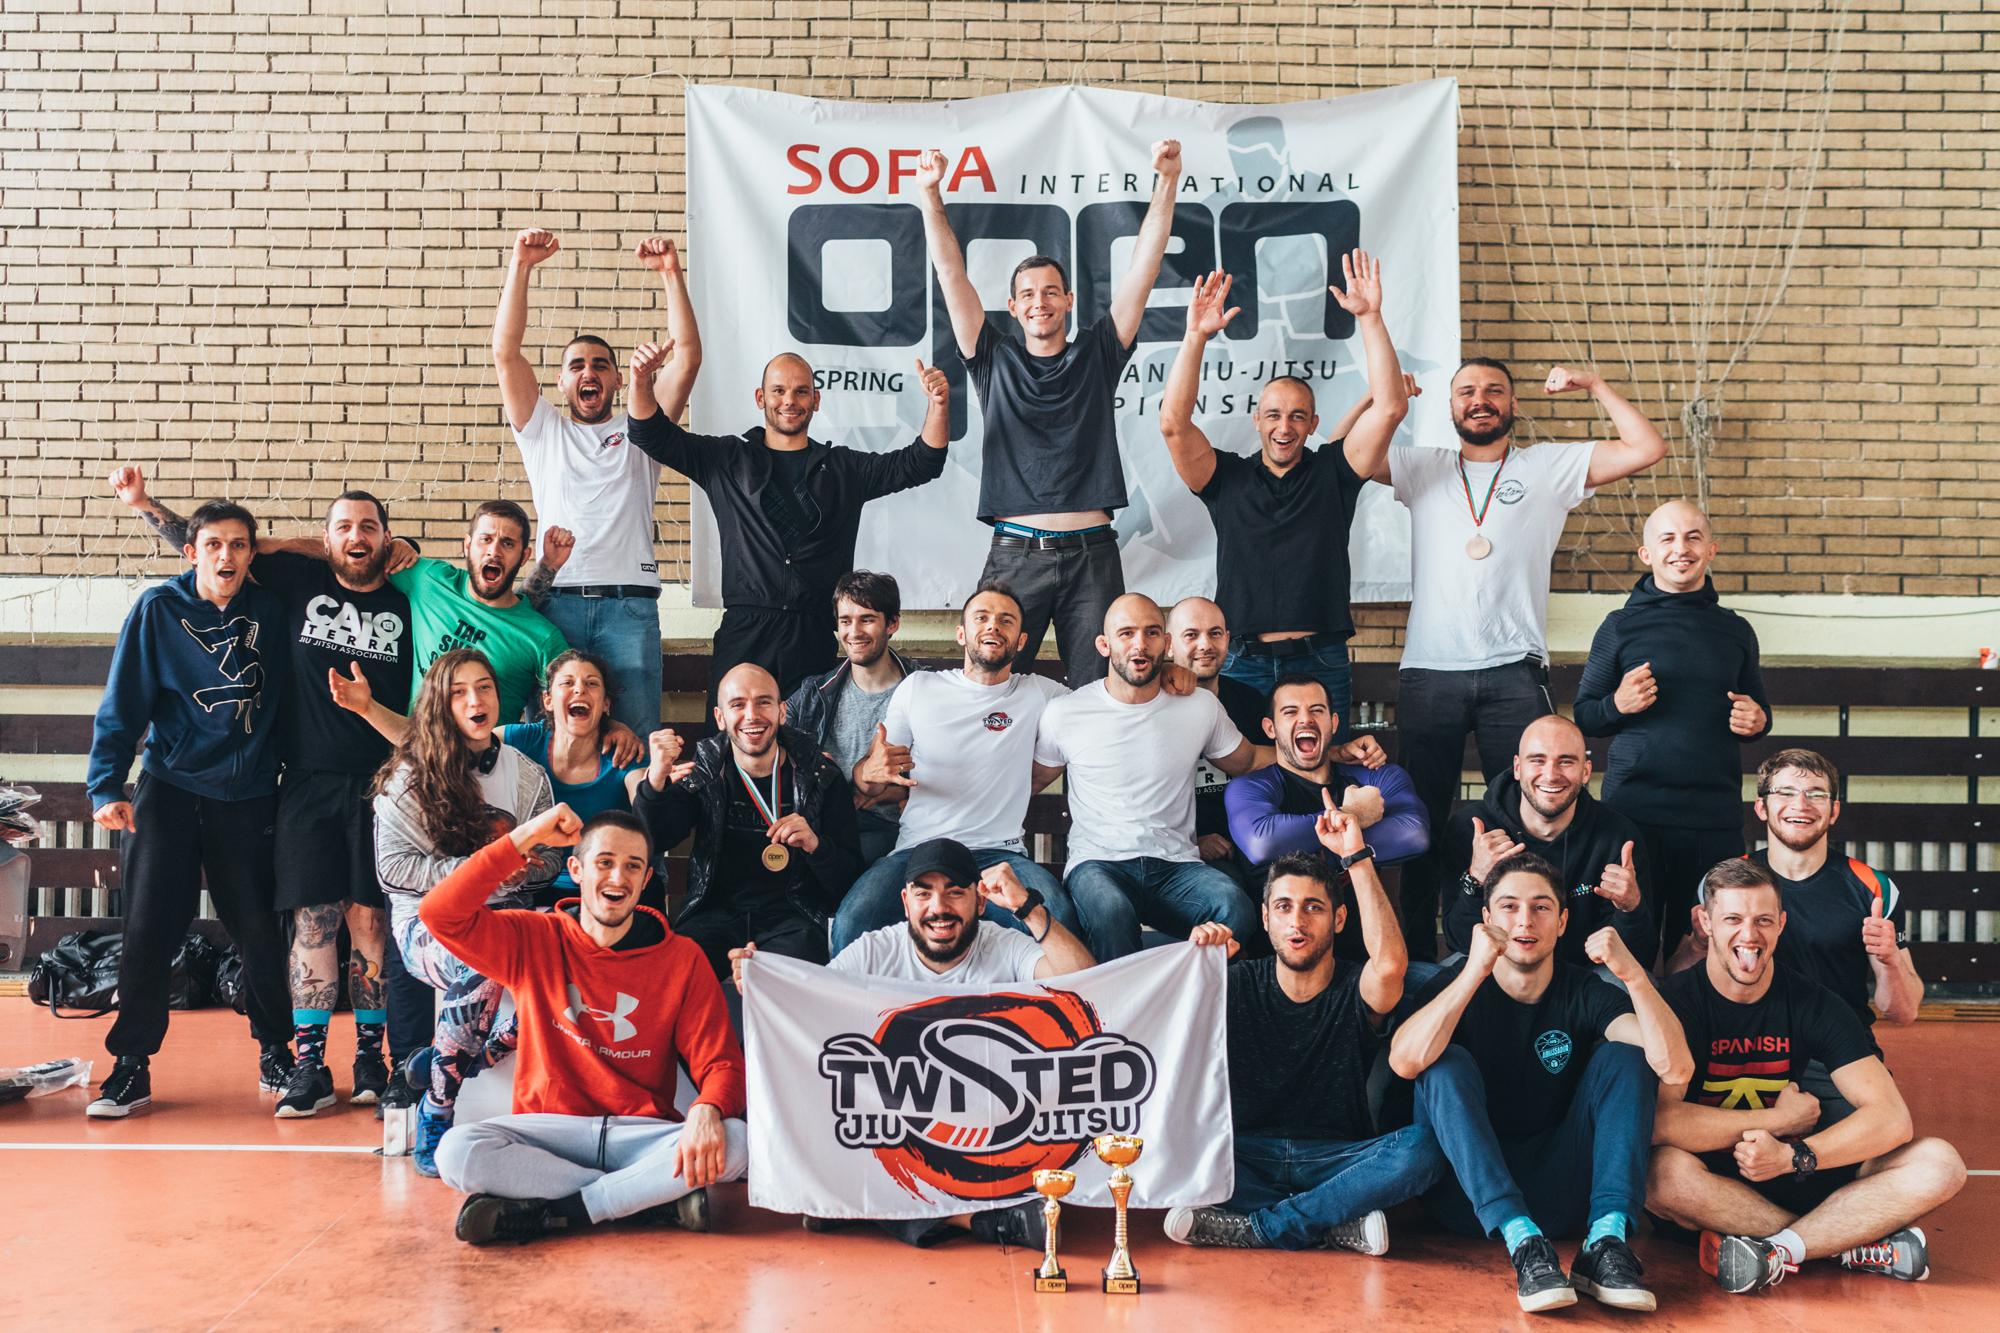 Sofia Open Spring 2019